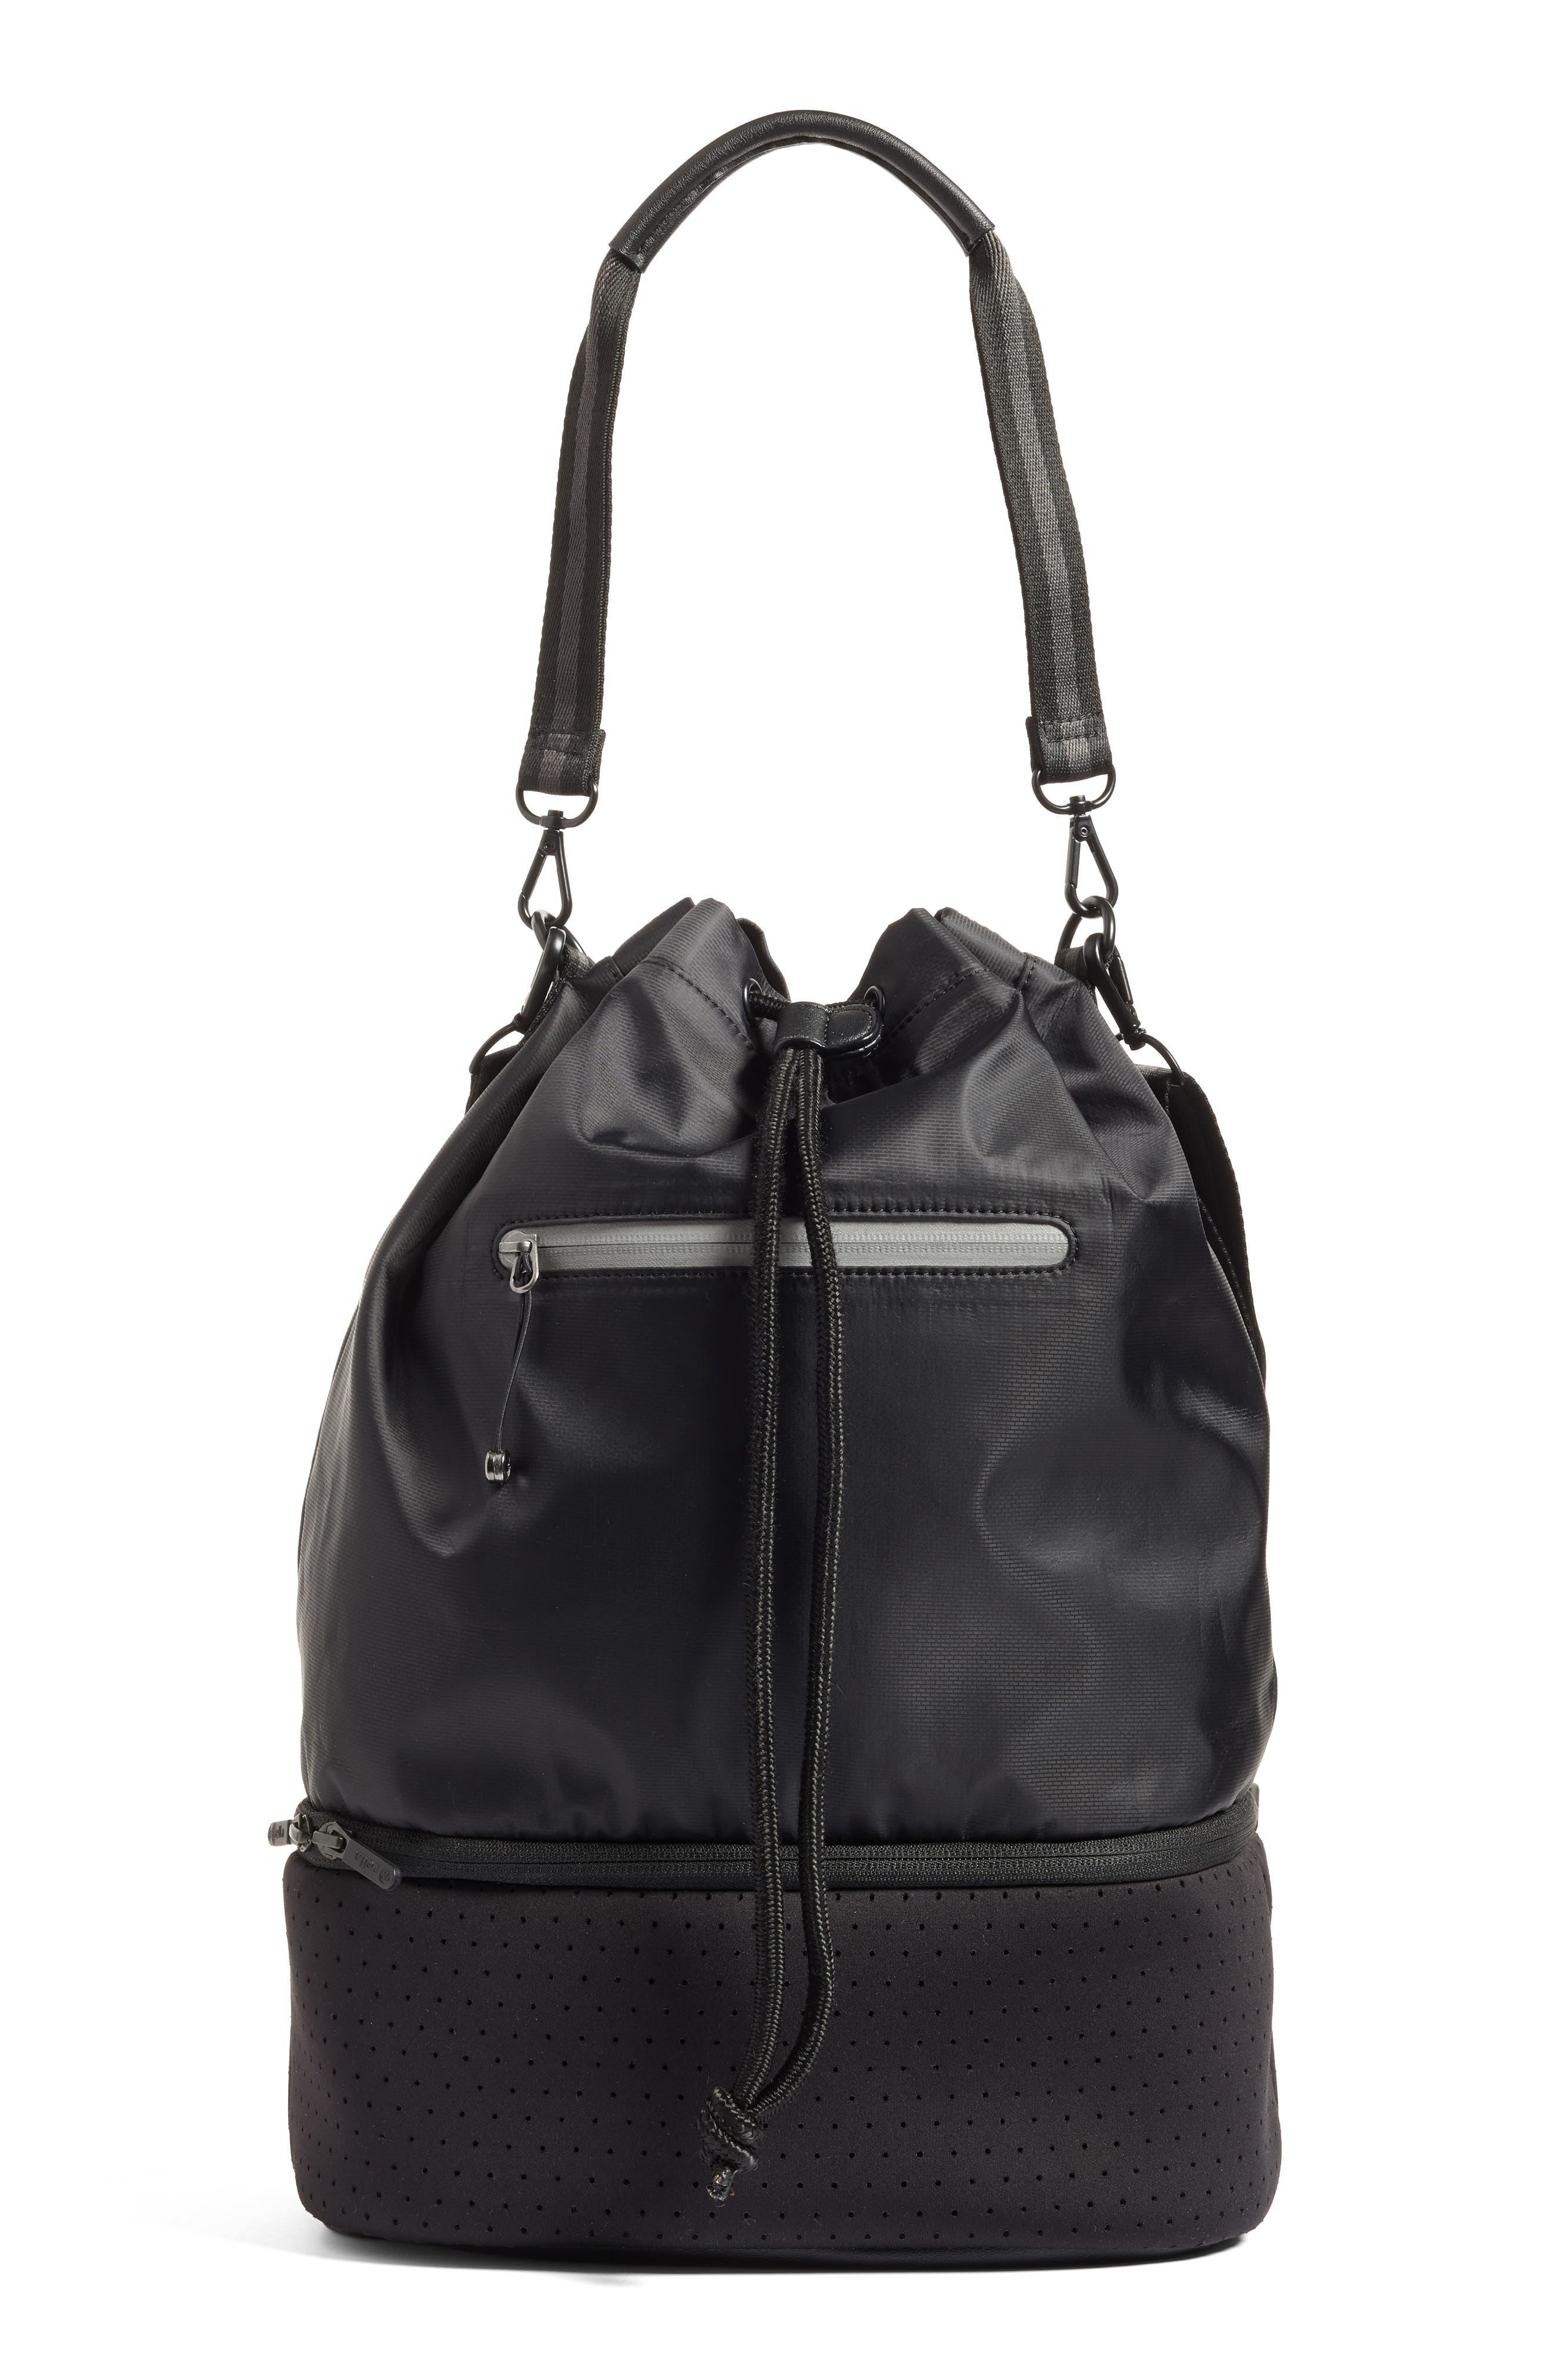 ZELLA Convertible Backpack, Main, color, 002